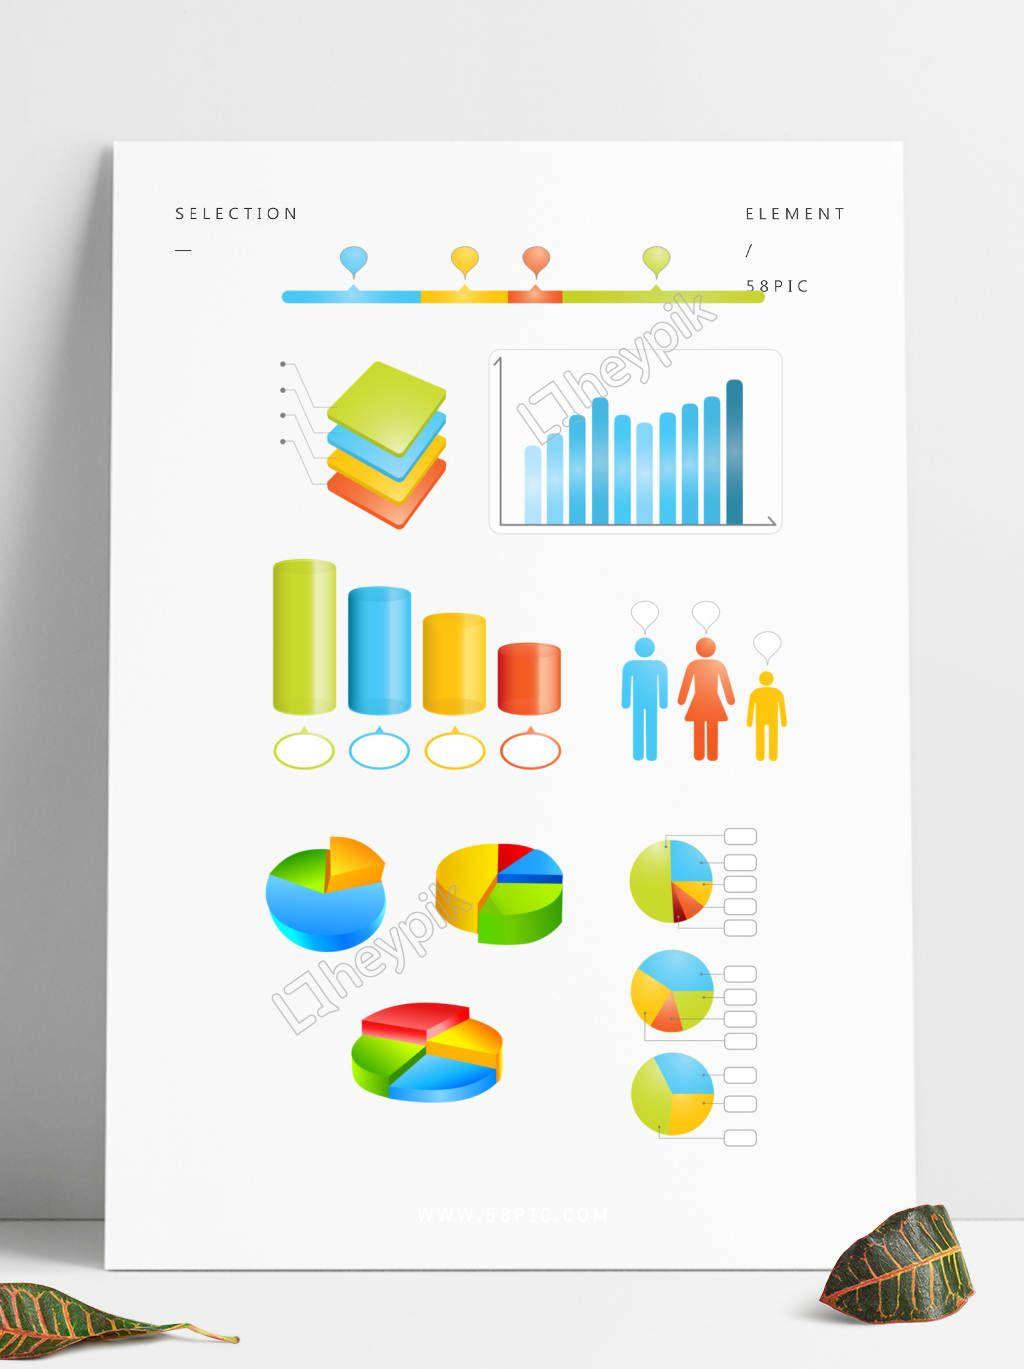 الرسم البياني والرسم مخطط دائري شخصية جولة Ppt قالب Powerpoint Ppt Elements Powerpoint Infographic